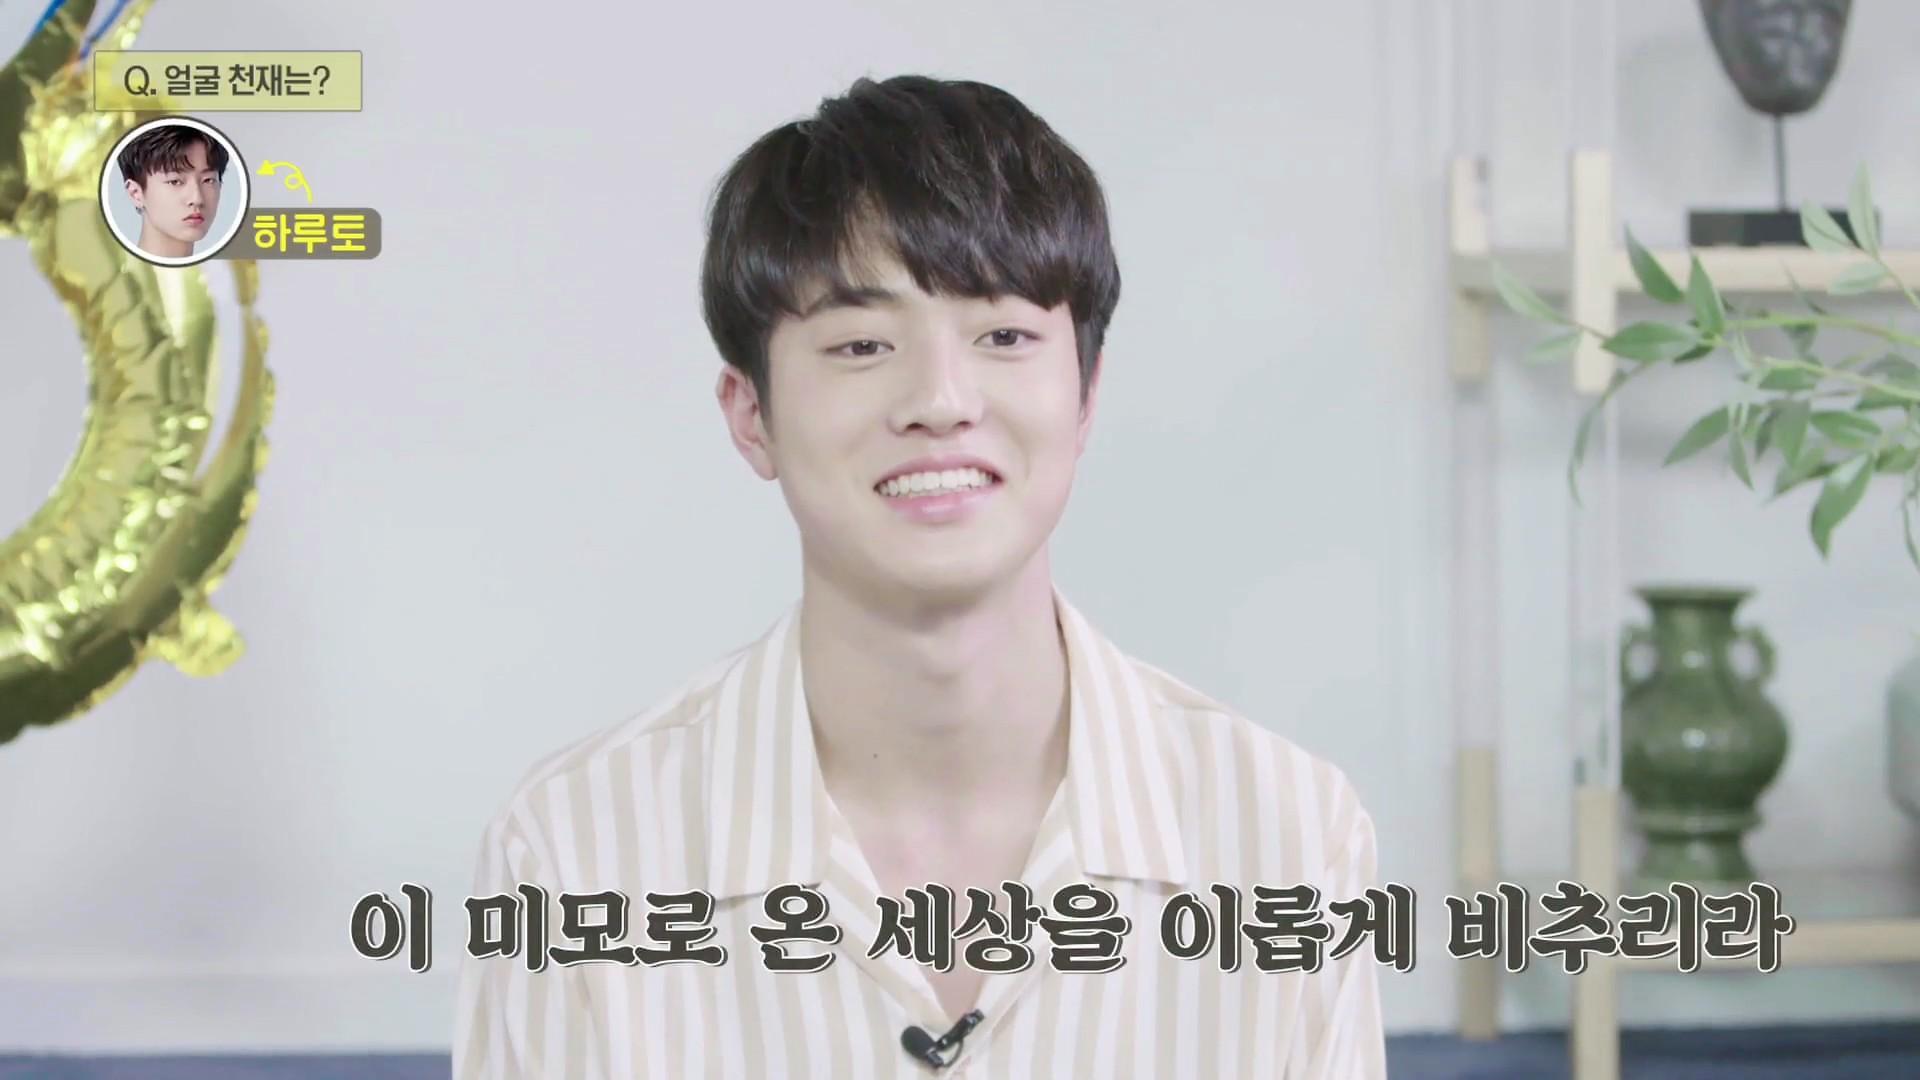 [SURVEY CAM] J#2 하루토 <HARUTO> l YG보석함